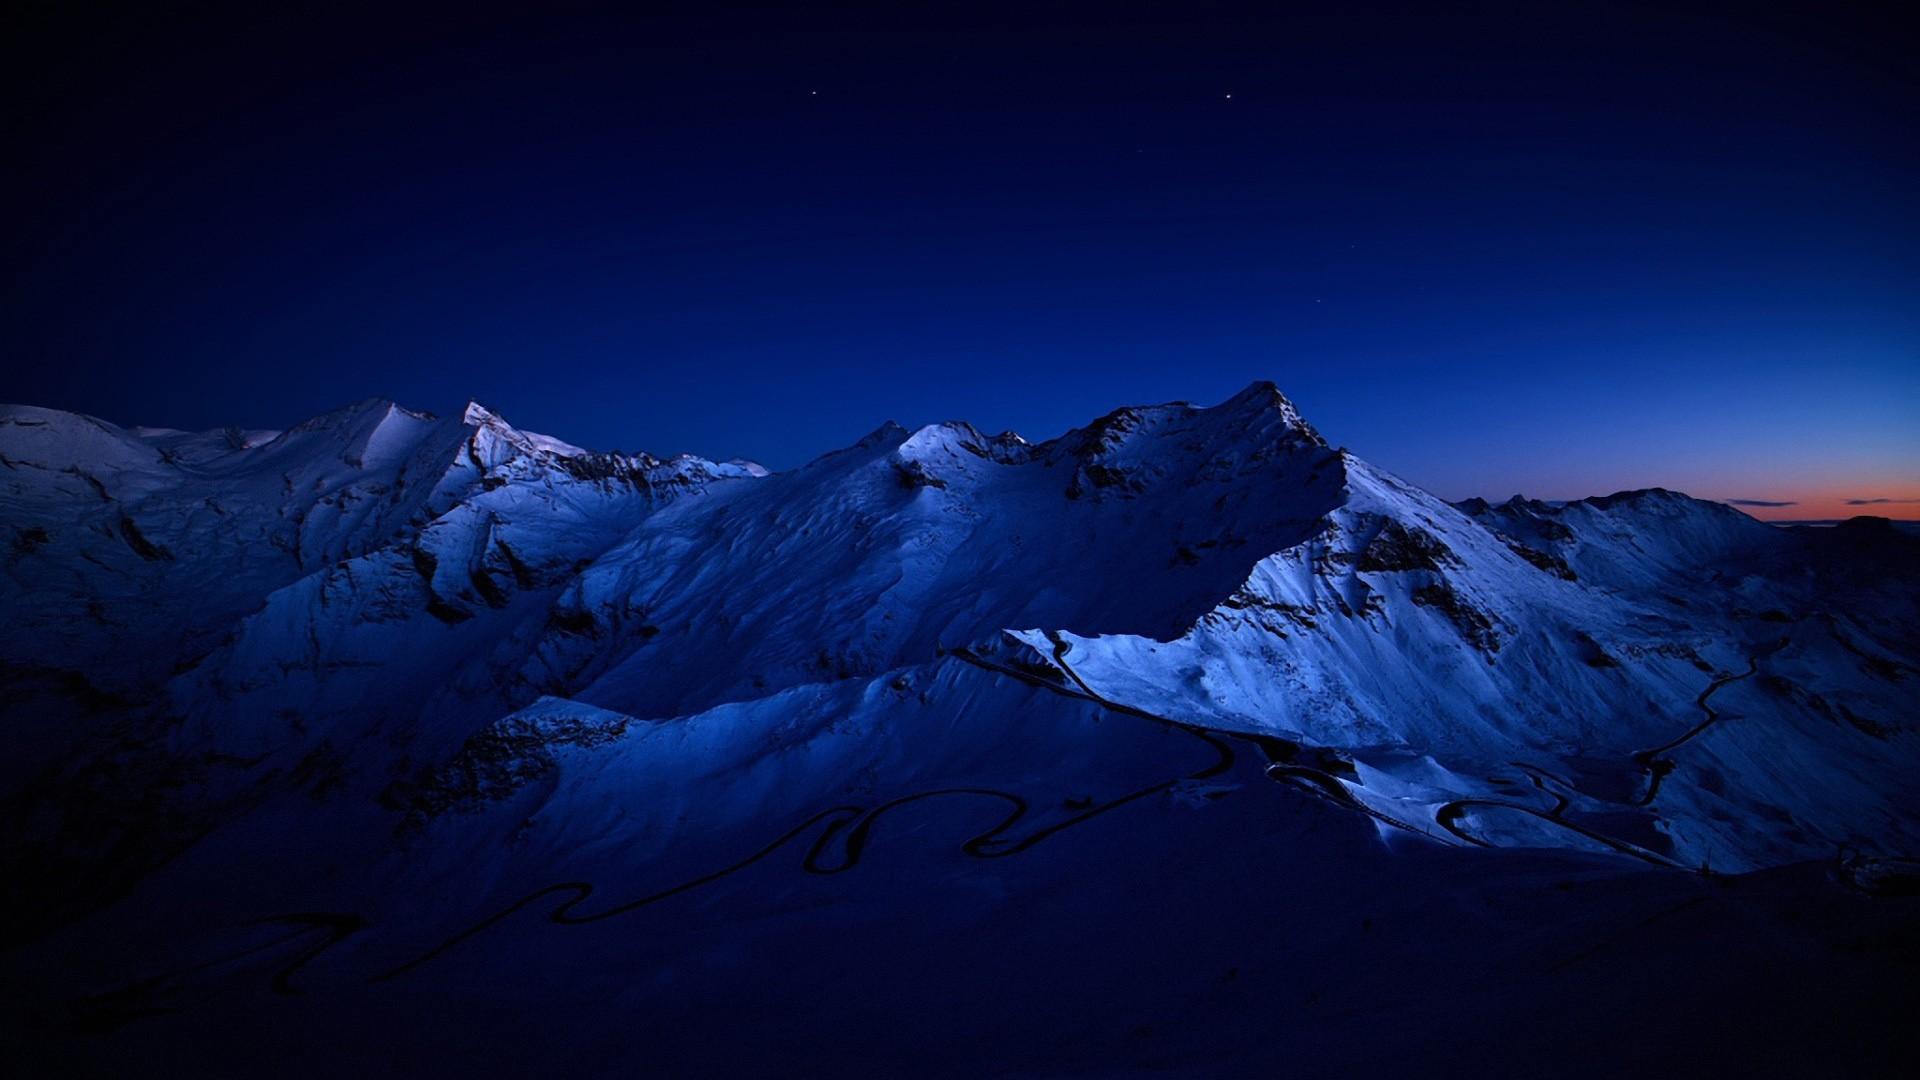 Night Mountain Wallpapers Free ~ Sdeerwallpaper